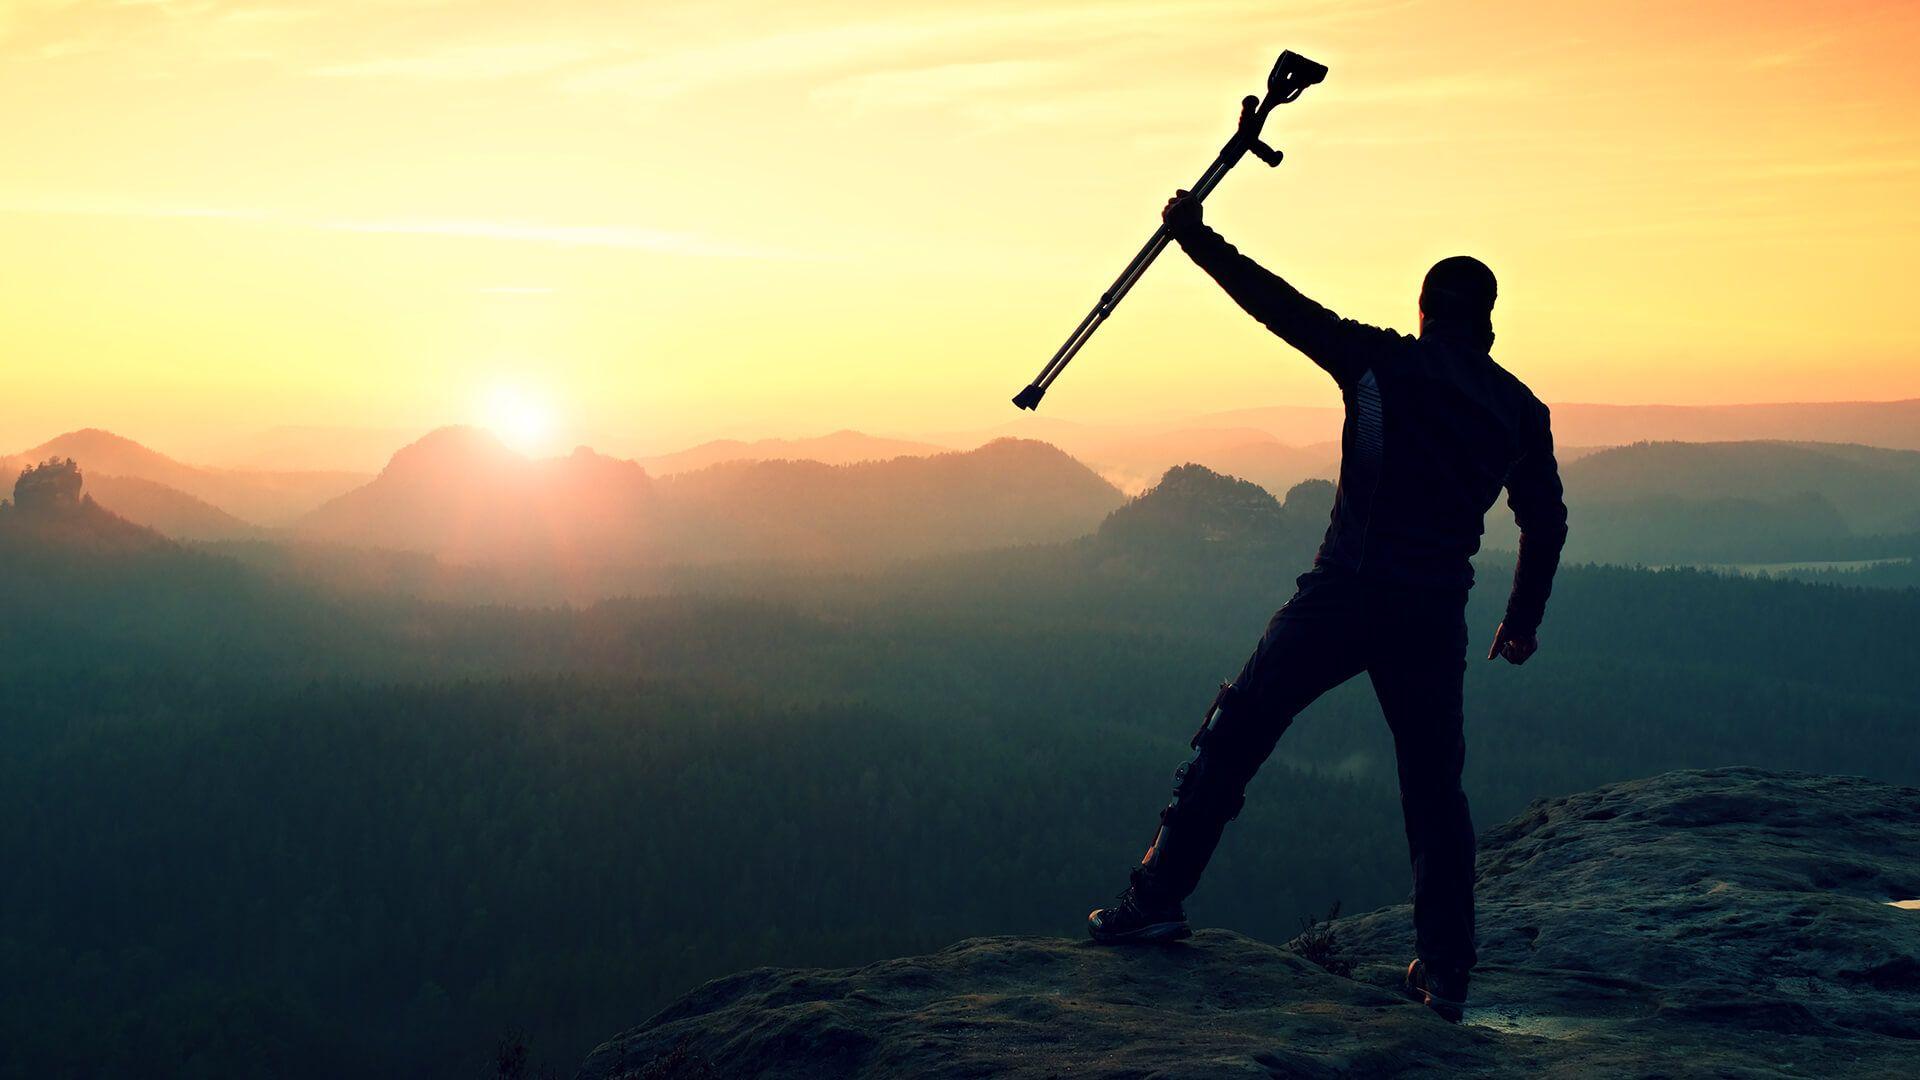 Tourist with forearm crutch above head achieved mountain peak.